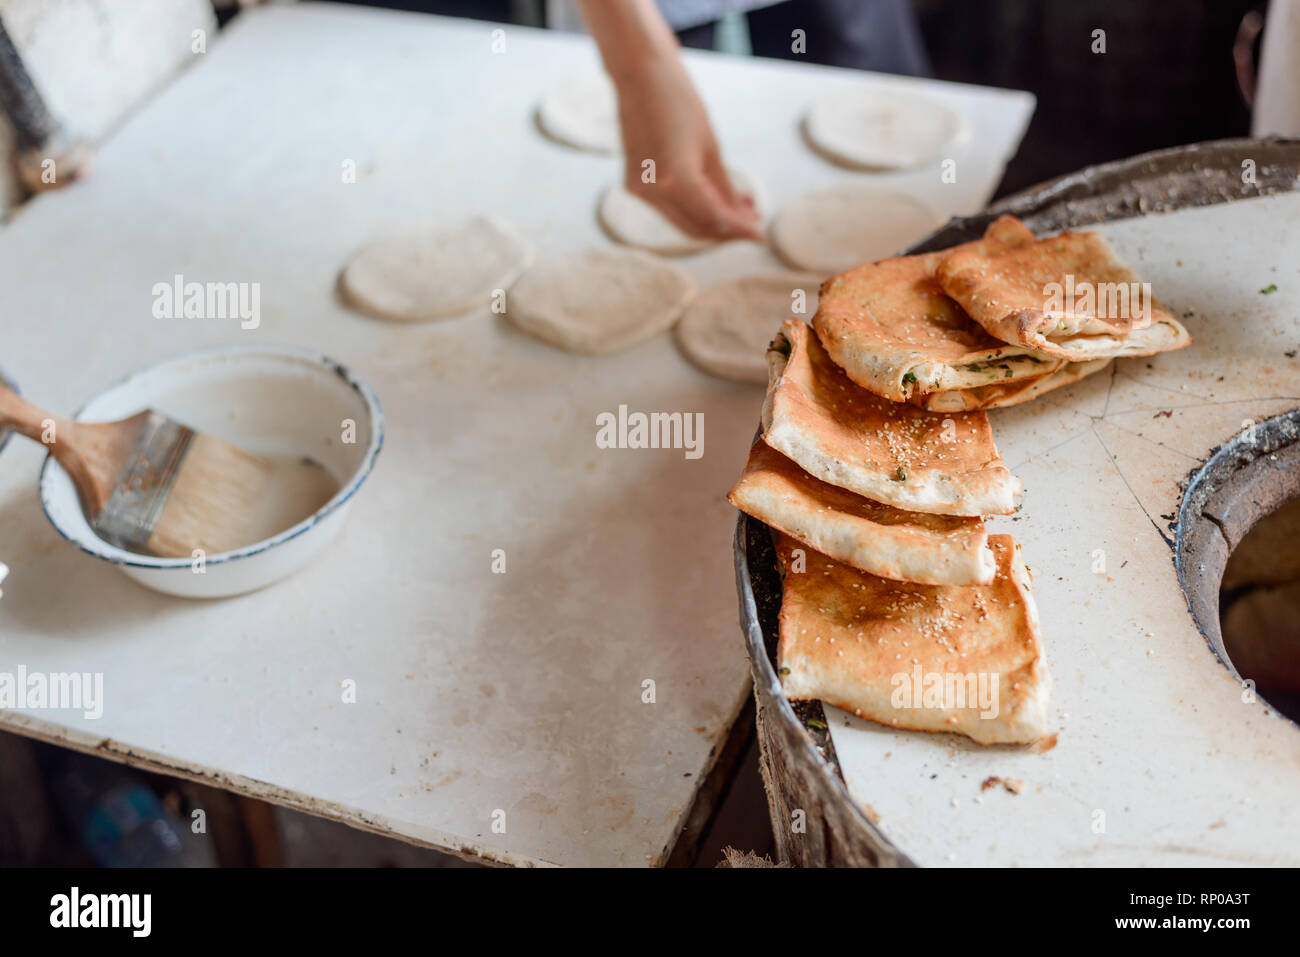 Freshly baked turnovers with scallion - Stock Image